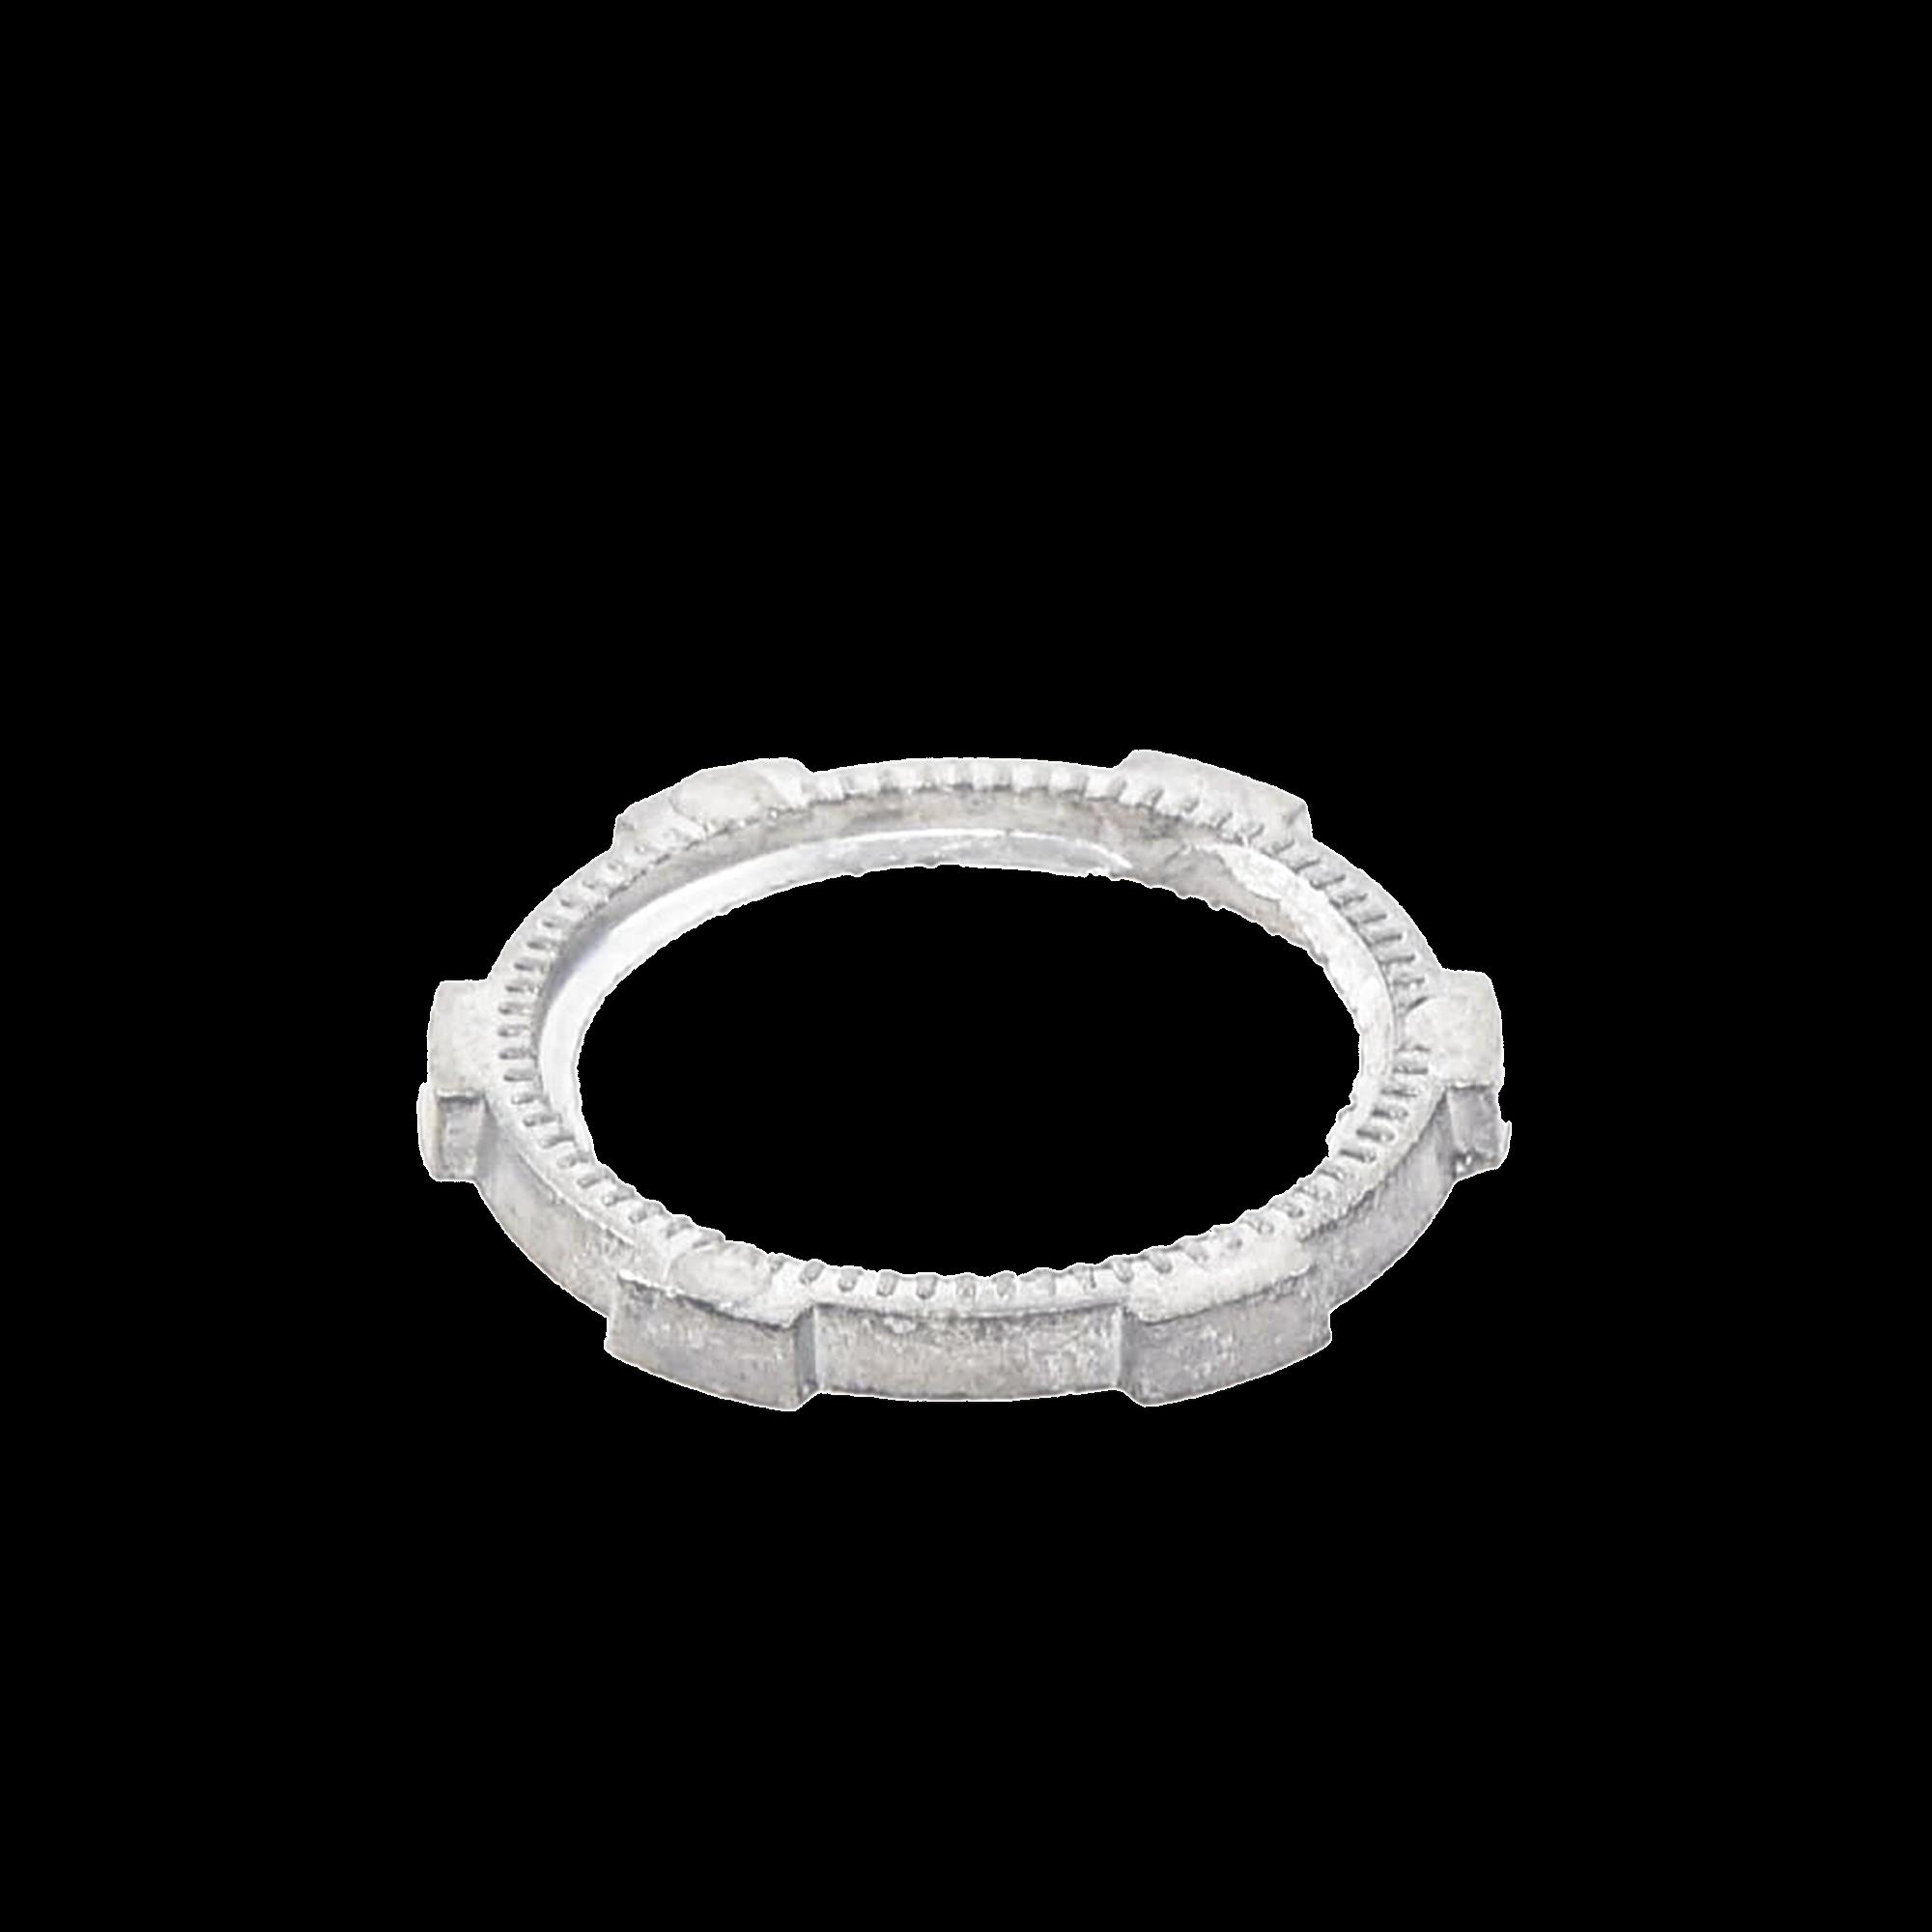 Contratuerca Metálica Zamac de 1 (25 mm)